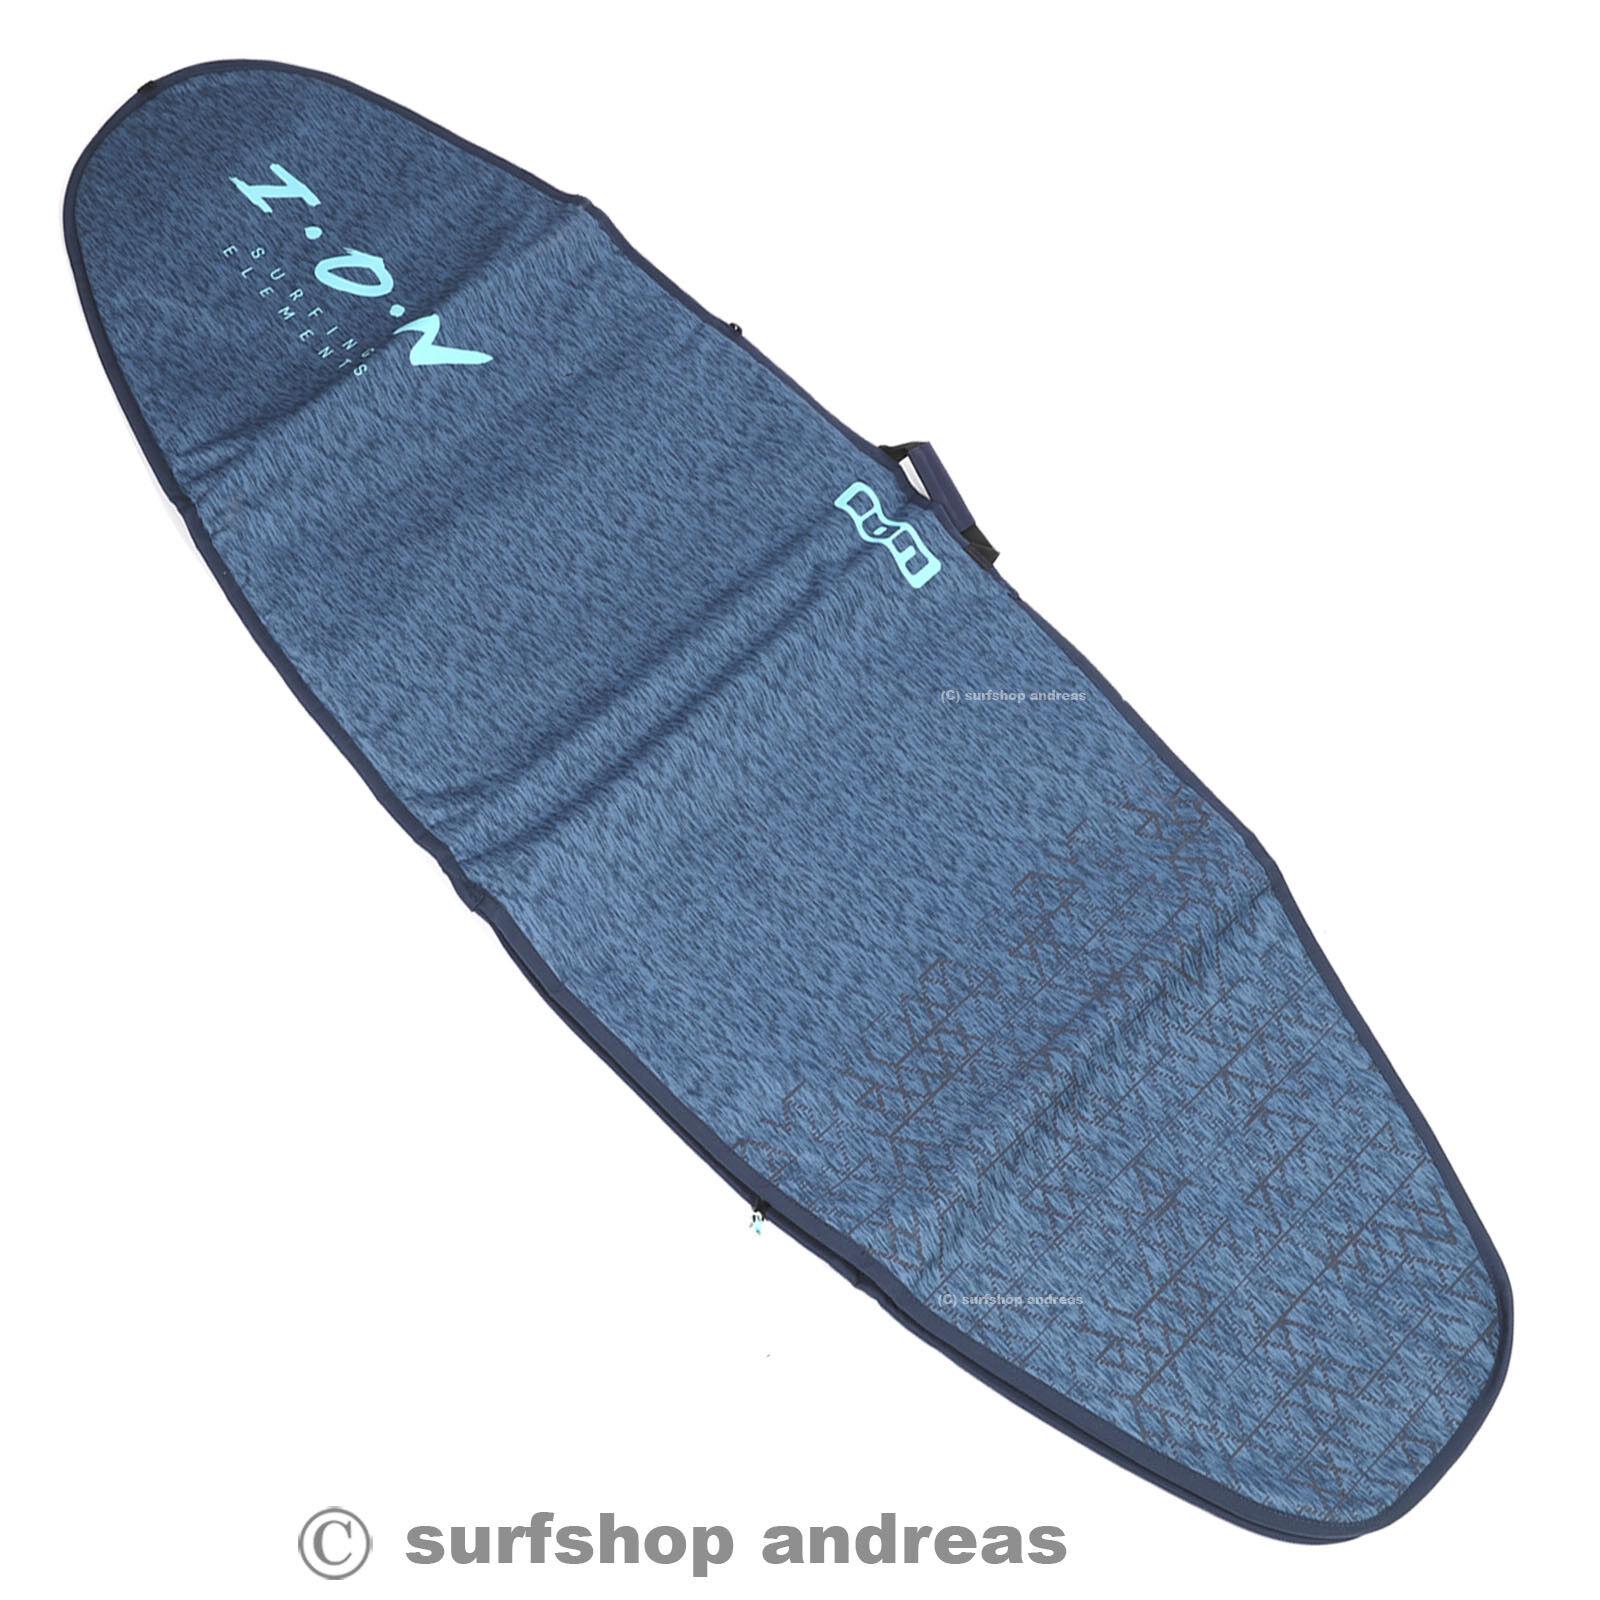 Windsurf Core Boardbag Stubby 2019 in 230 / 235 cm Surfbag für Surfboard